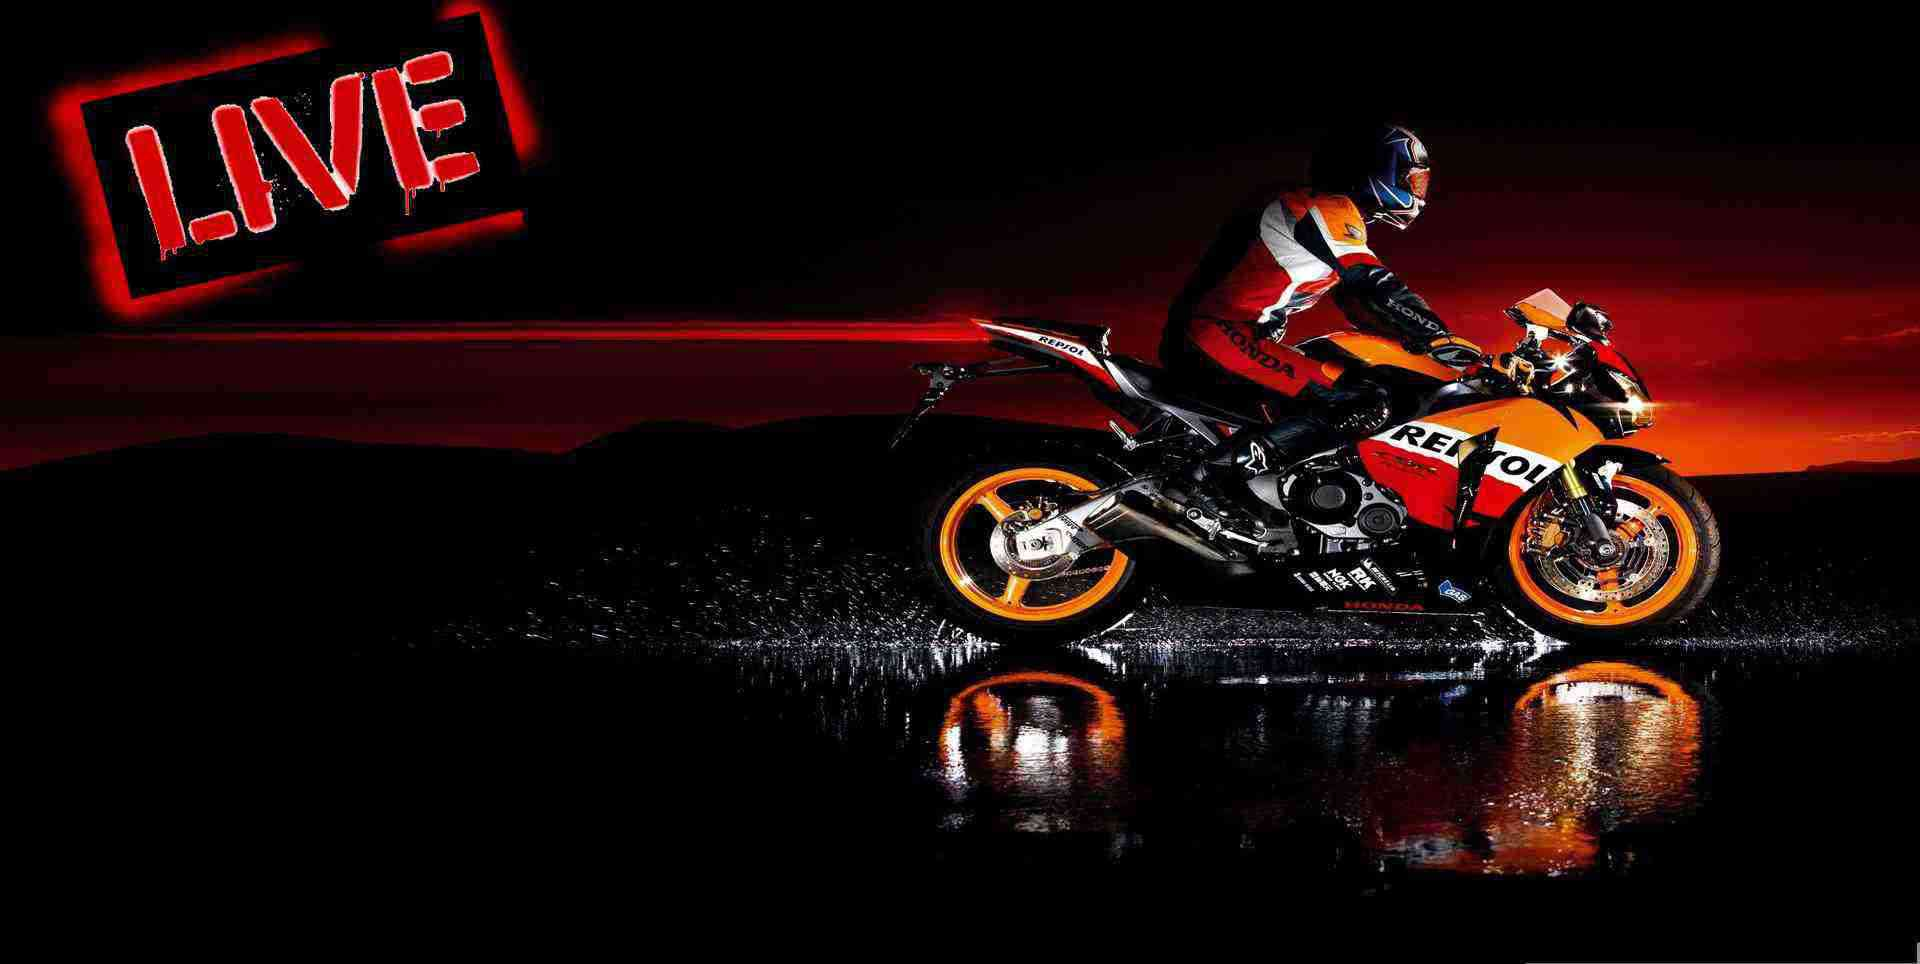 super-bike-2015-pirelli-spanish-round-11-live-telecast